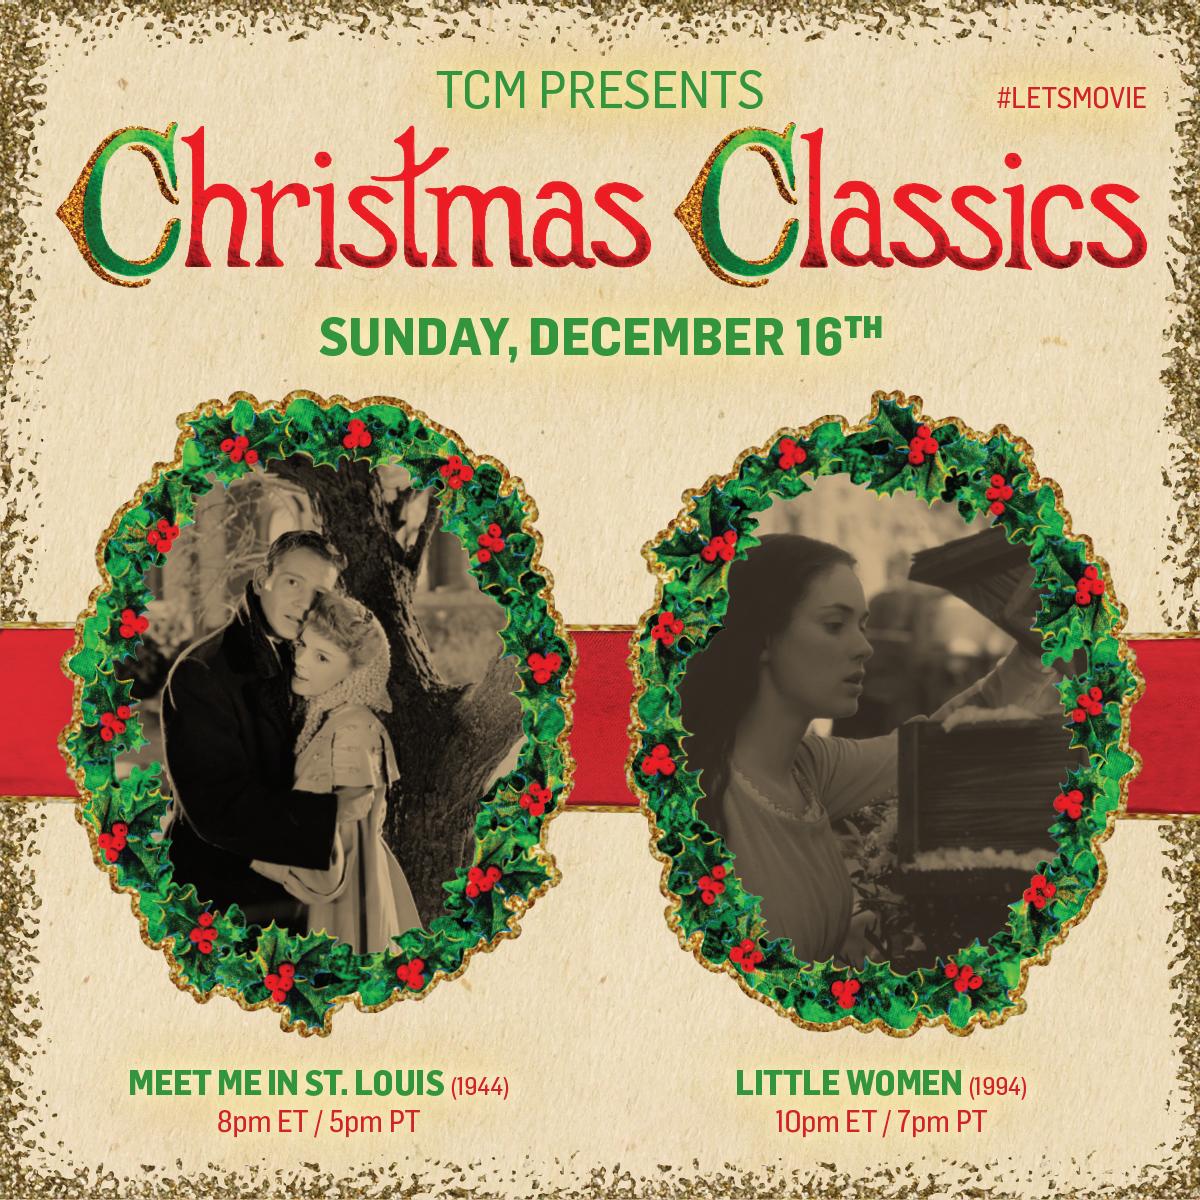 TCM_SocialAssets_18-11_ChristmasClassicsAssets_1200x1200_FNL-Series-6.jpg